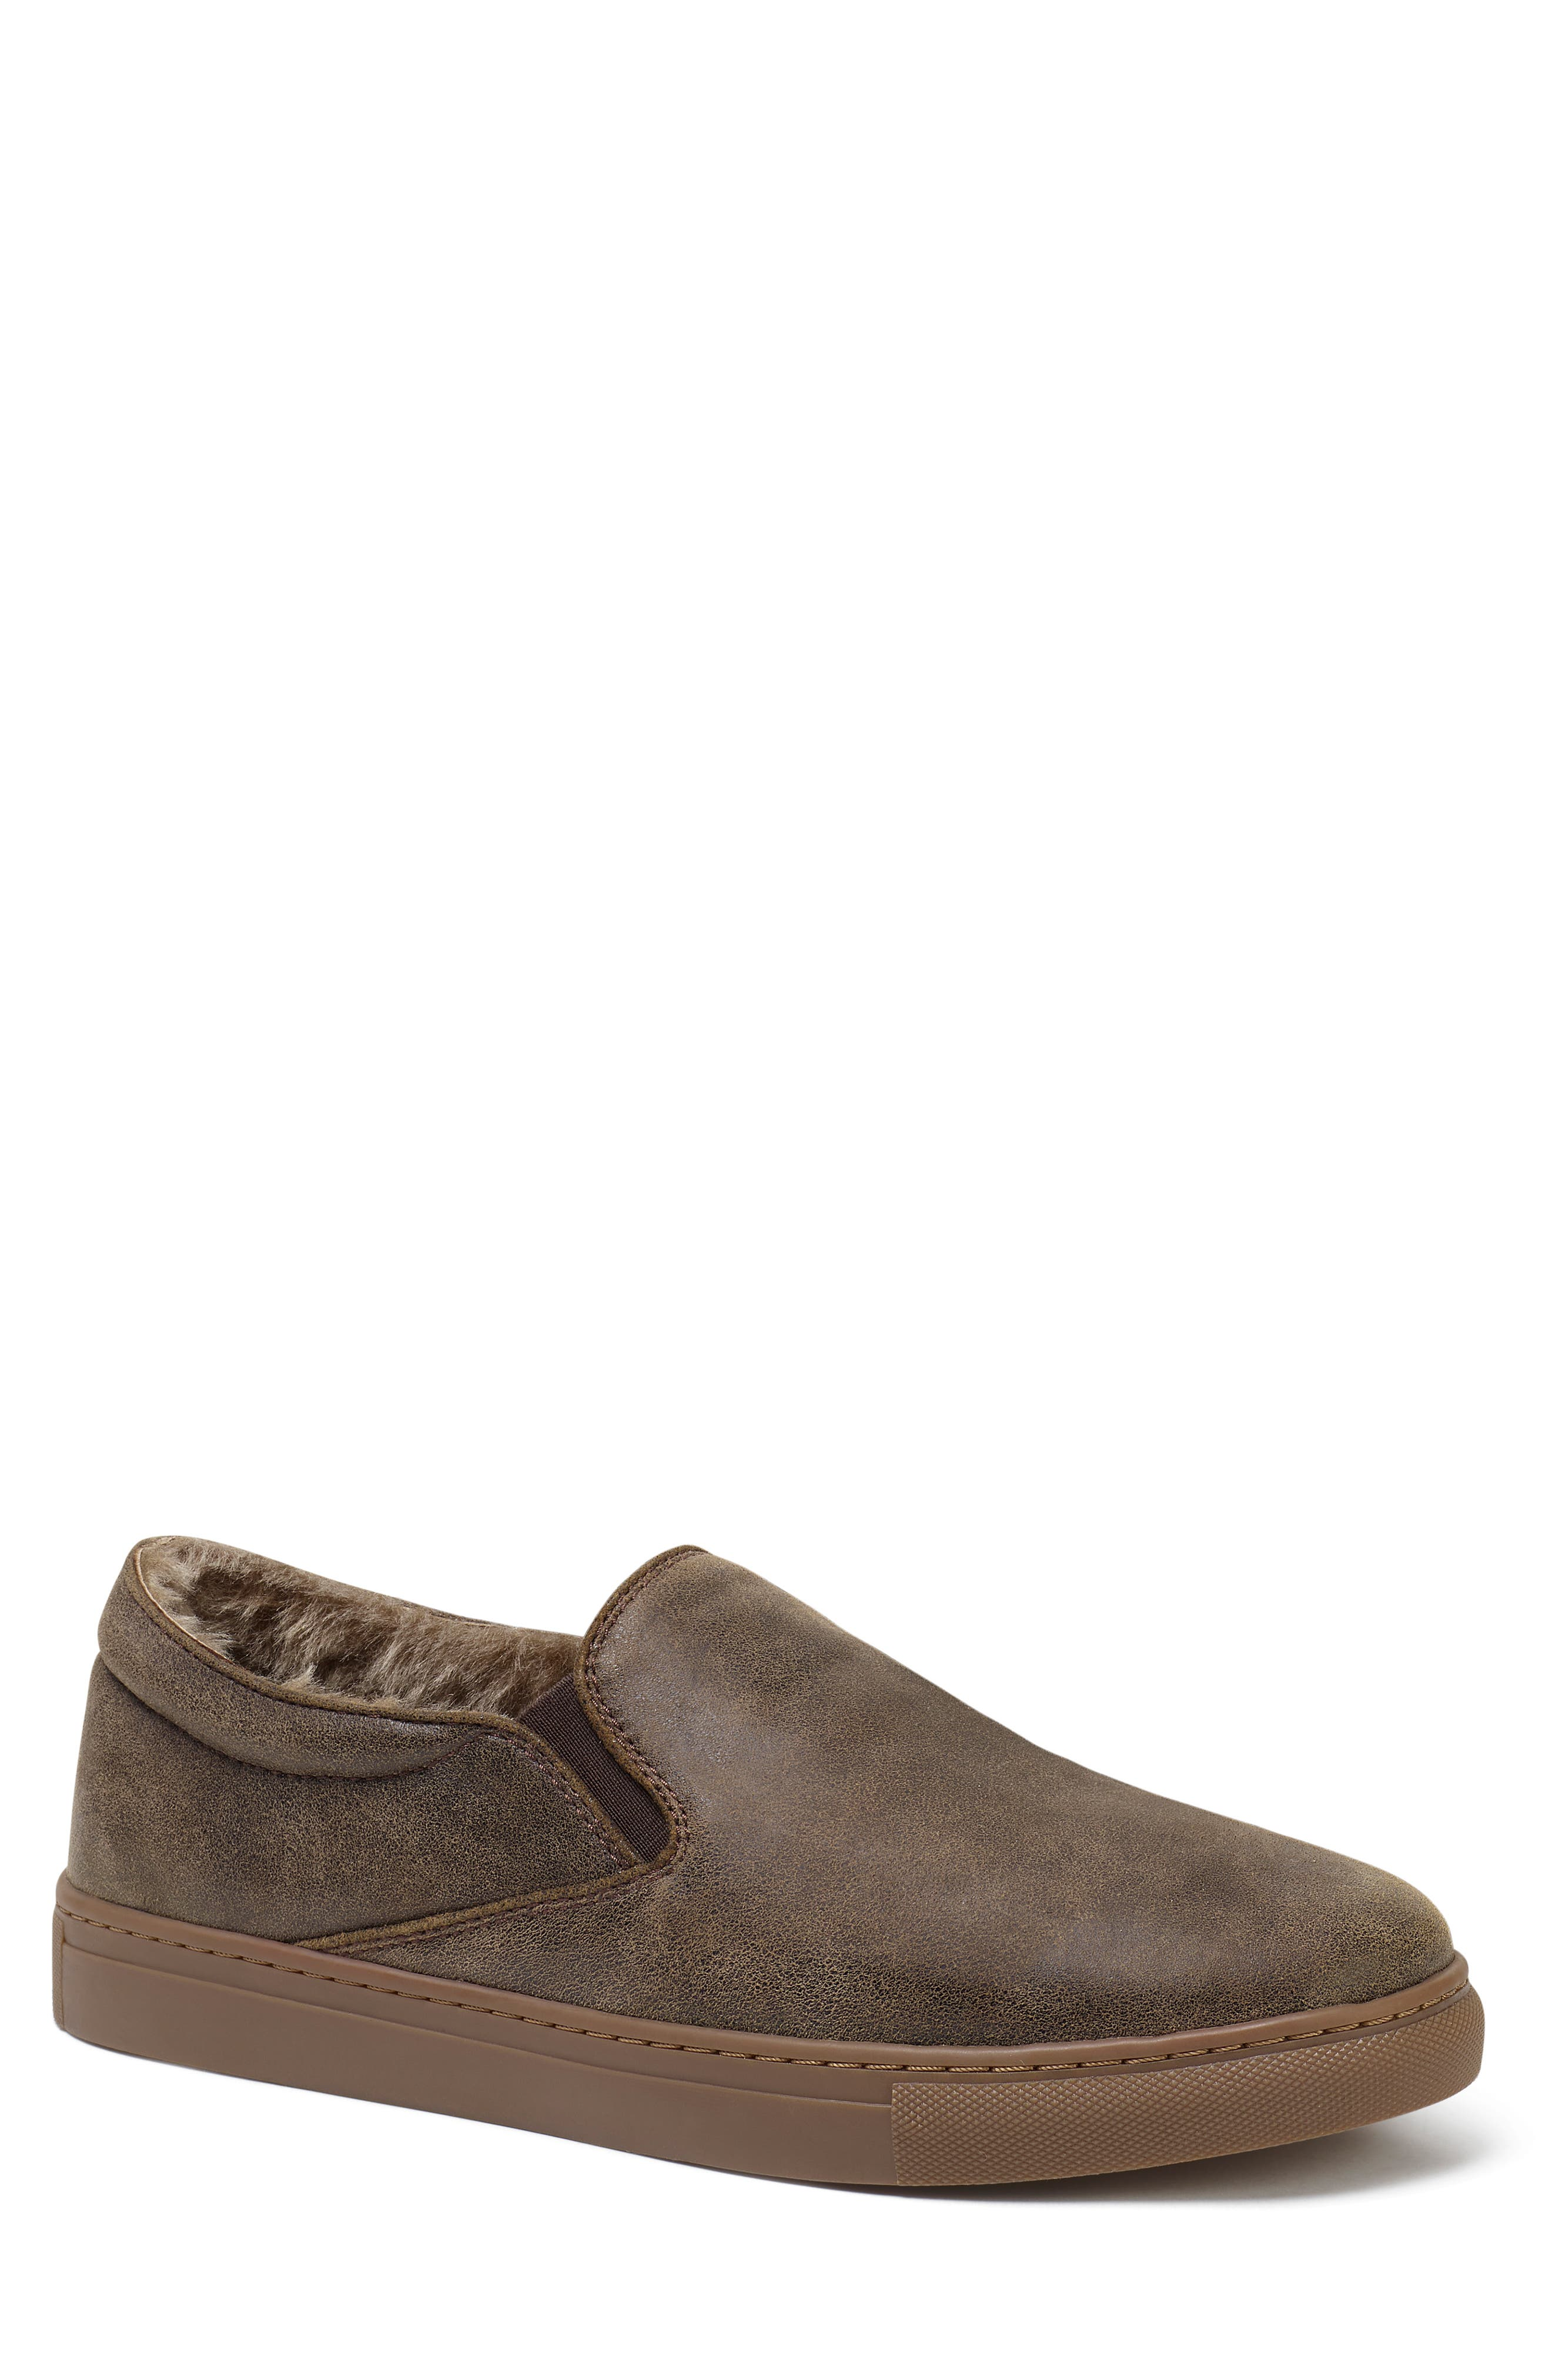 Alex Genuine Shearling Slip-On Sneaker,                         Main,                         color, BROWN SUEDE